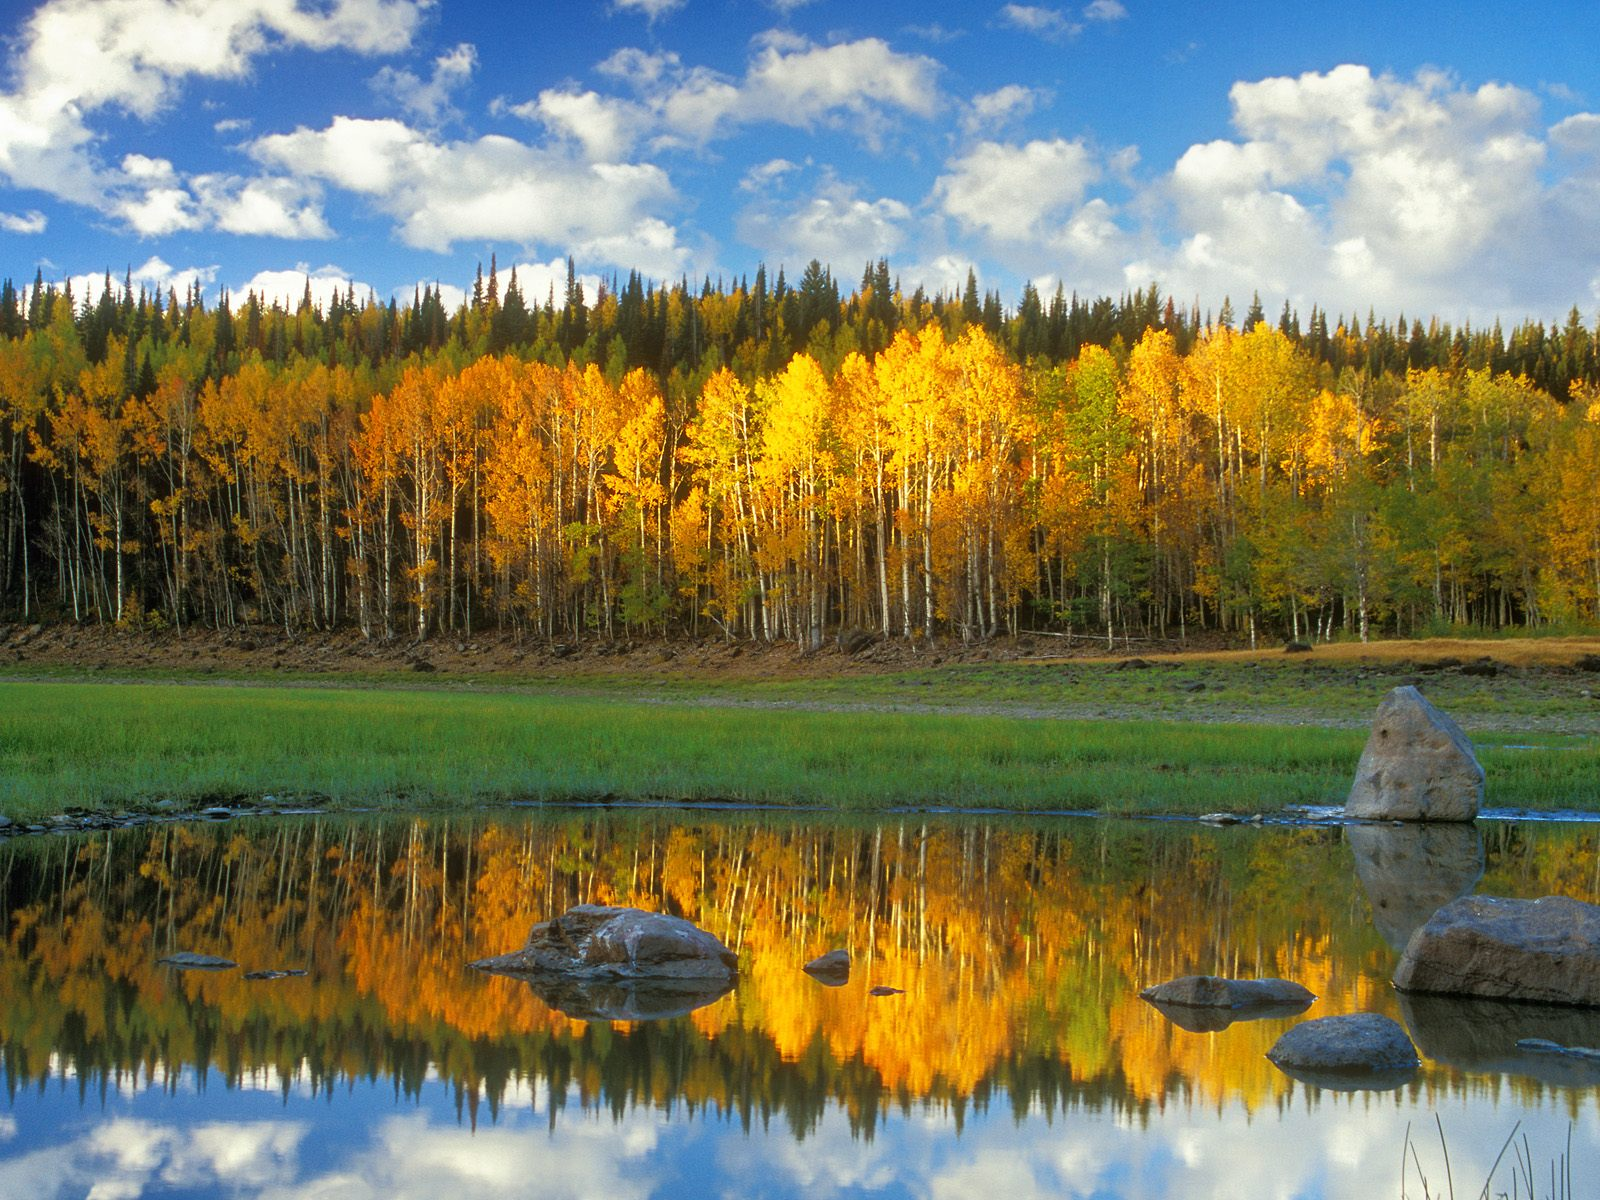 autumn scene wallpaper 1600x1200